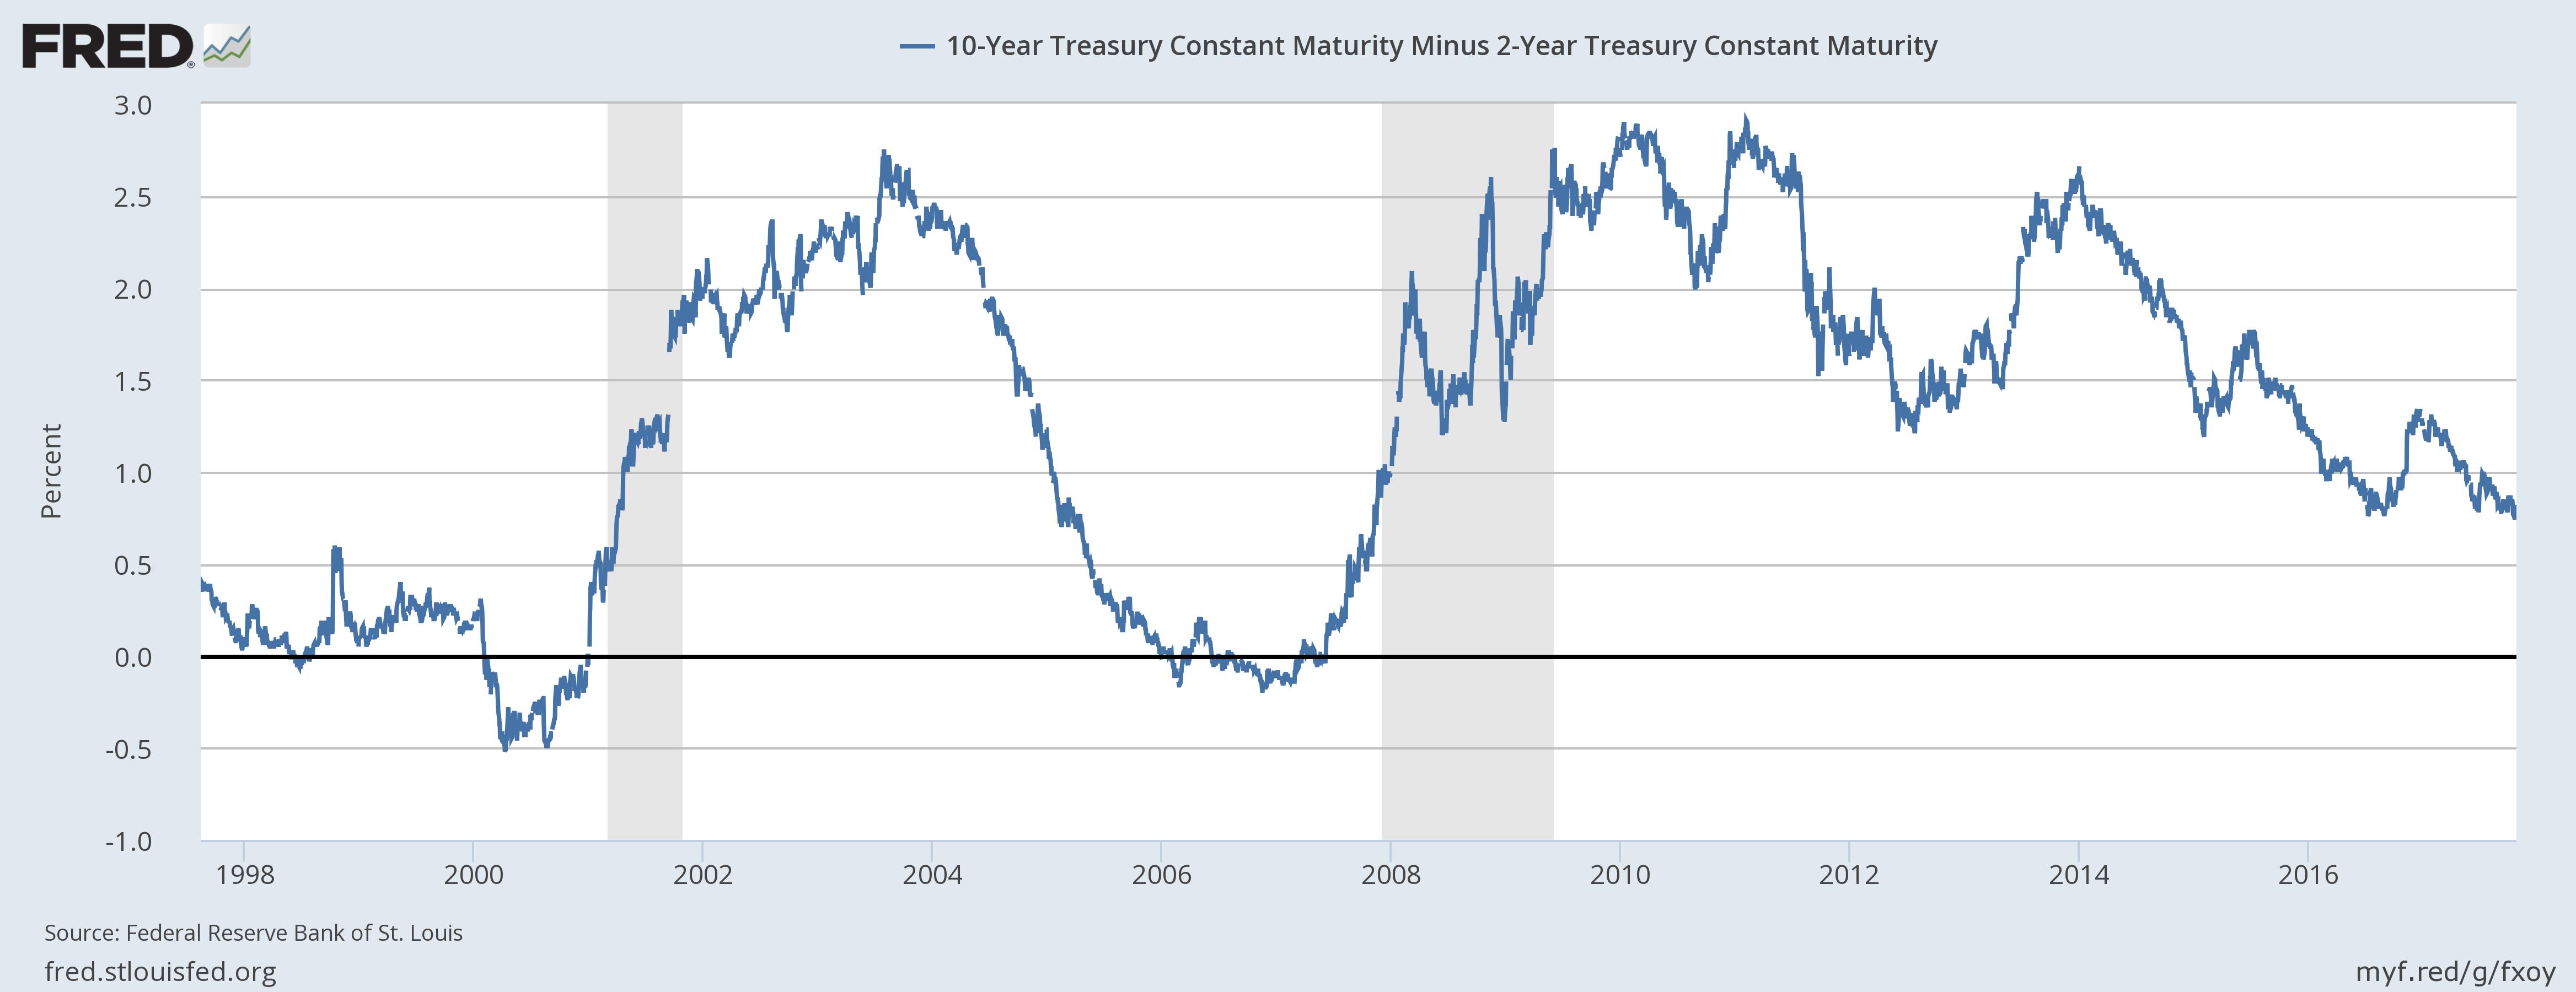 US 10 Year Treasury Constant Maturity, 1998 - 2016